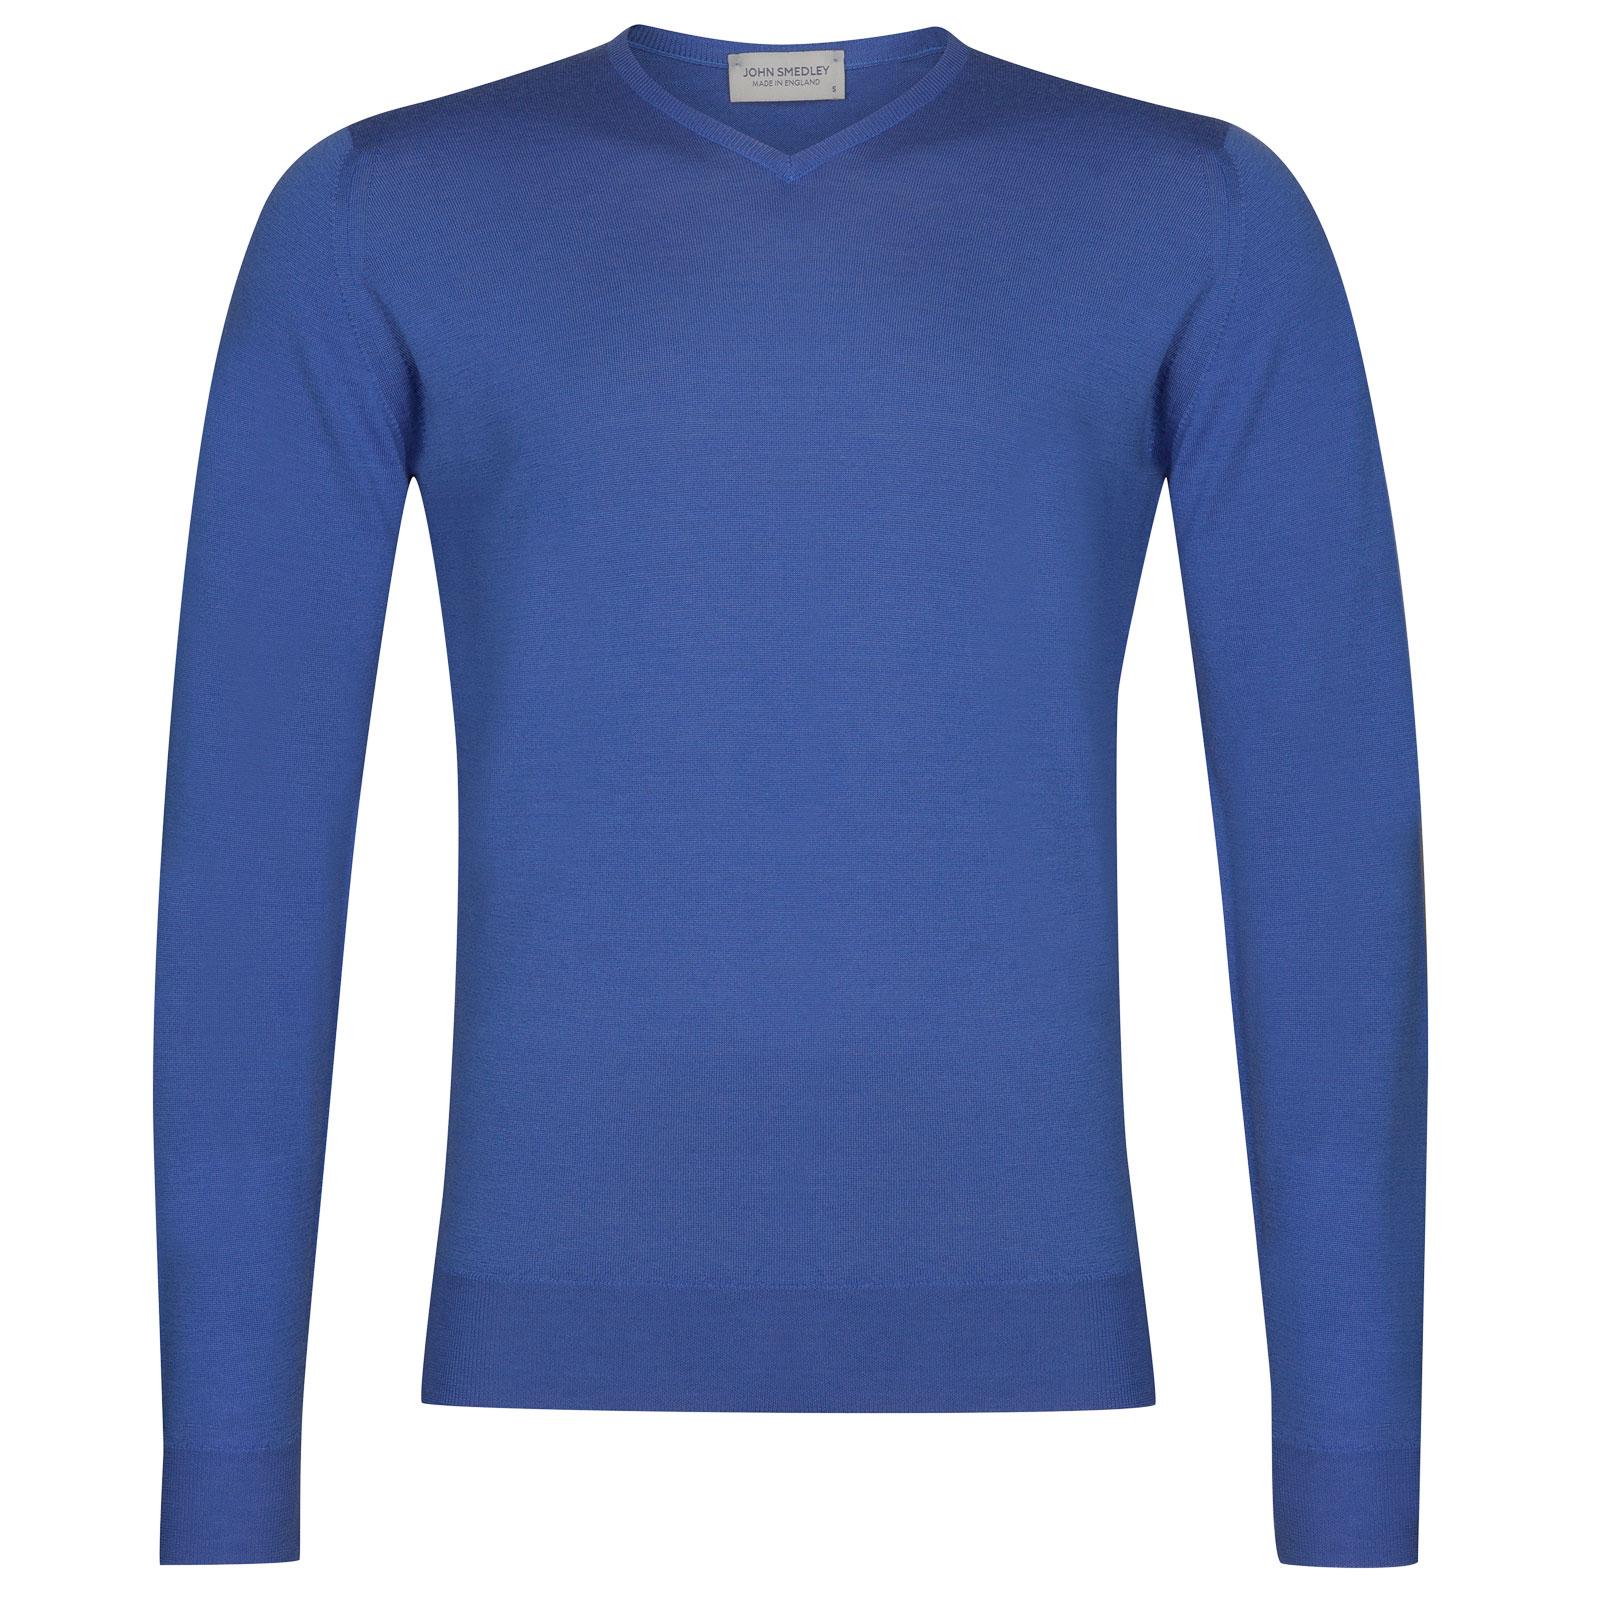 John Smedley Shipton Merino Wool Pullover in Chambray Blue-S